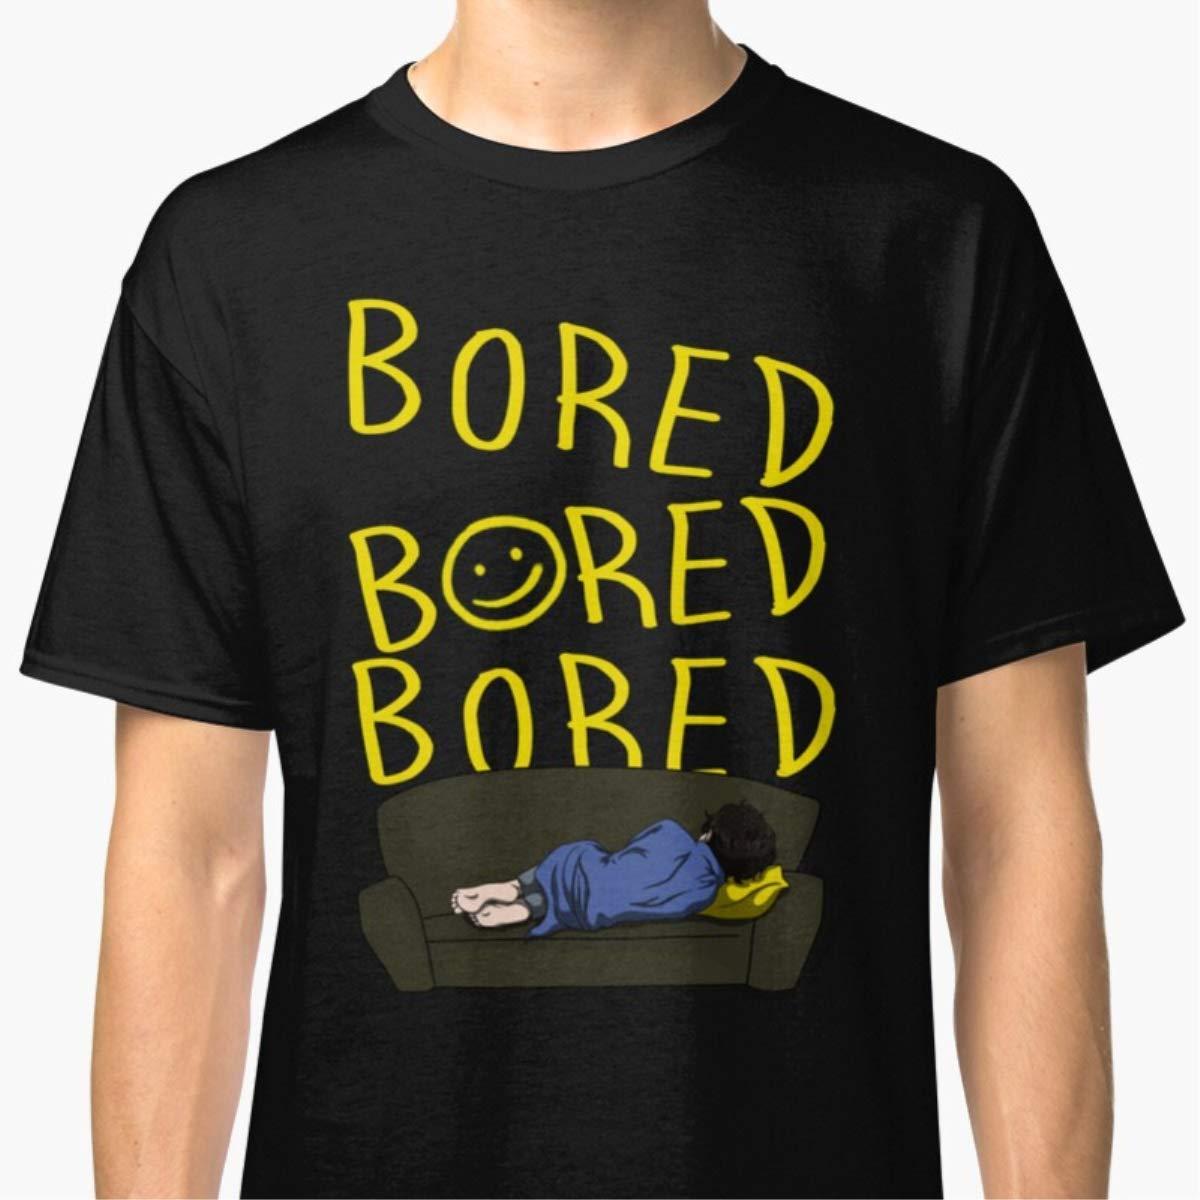 Unisex T-Shirt Bored Sherlock Shirts For Men Women Mon Dad Mothers Day